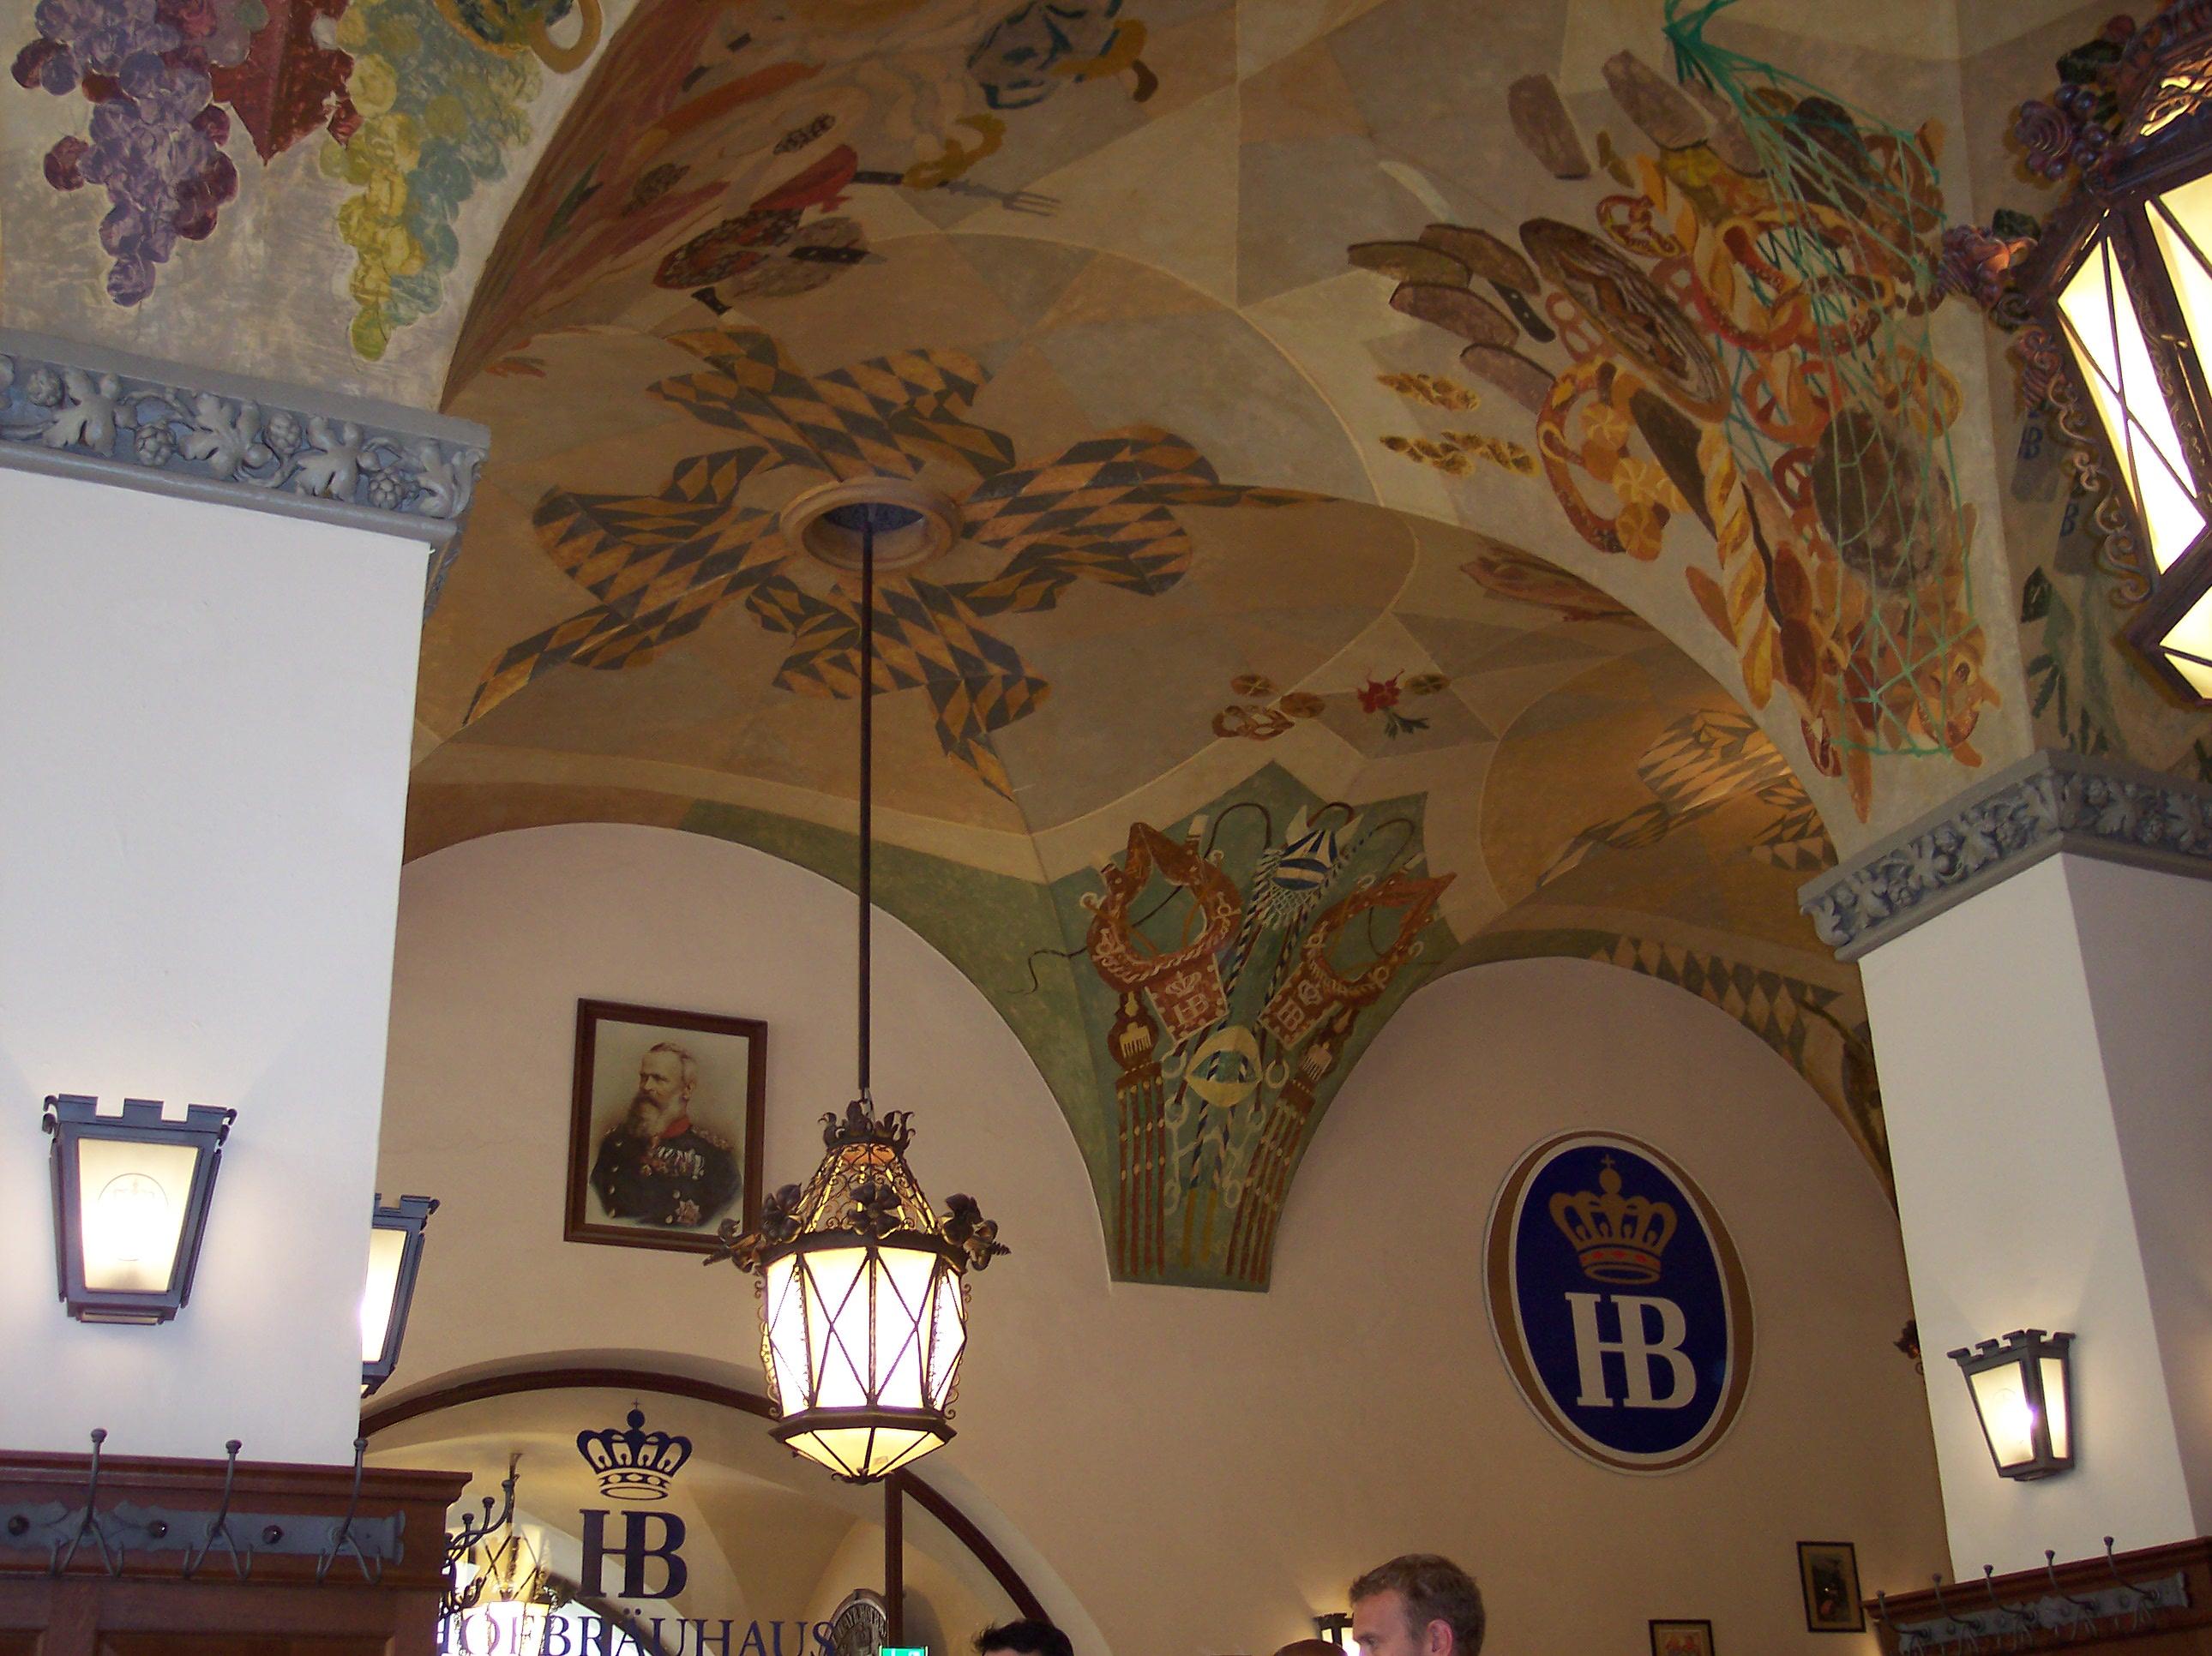 sevenpics presents - Hofbräuhaus